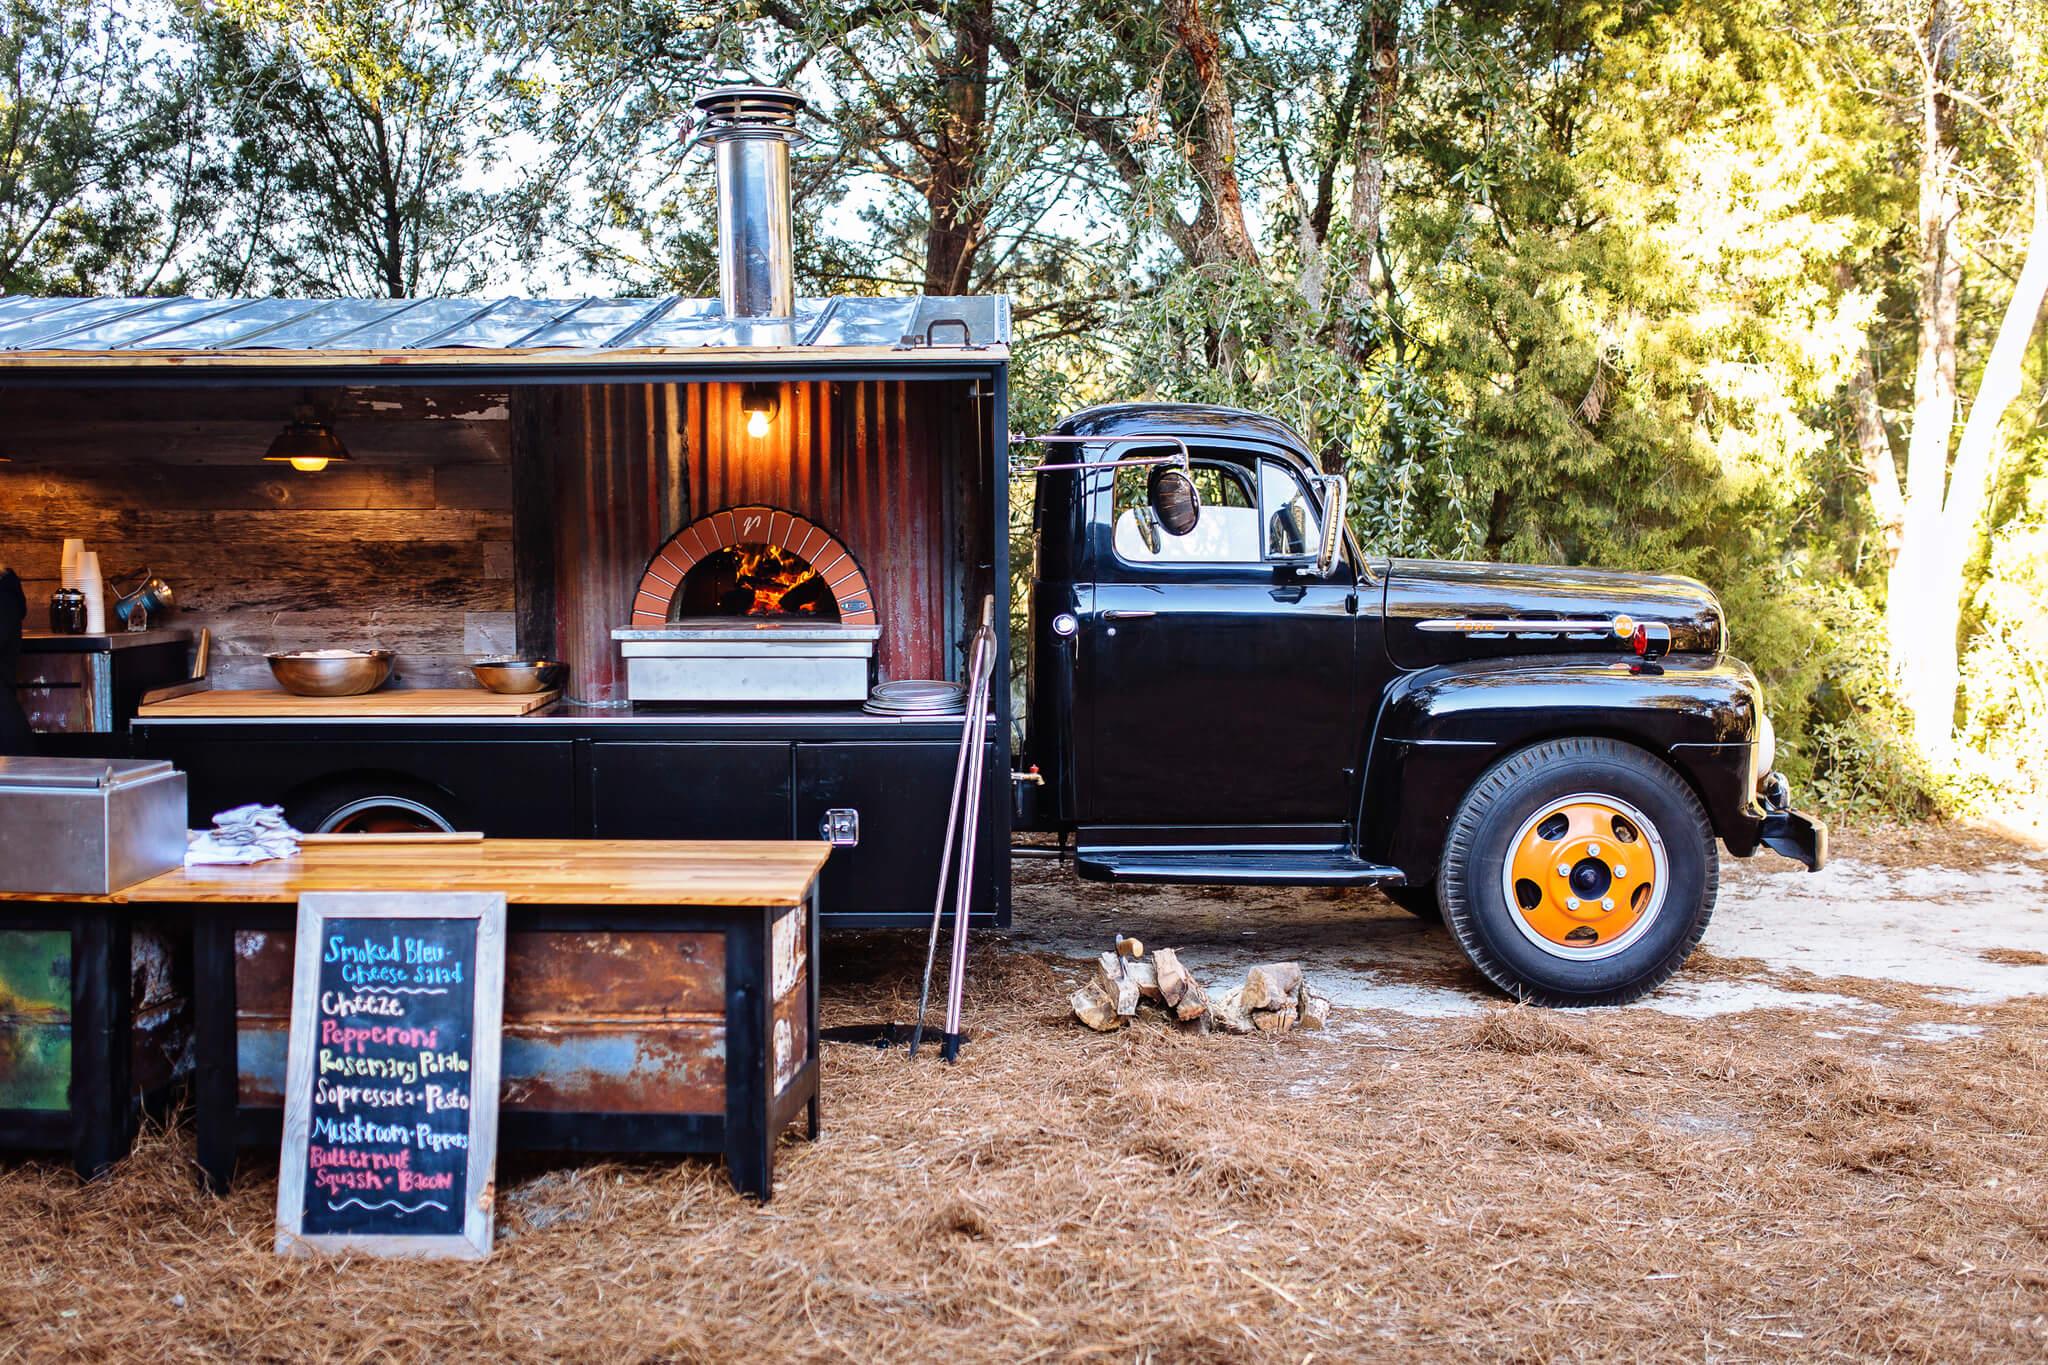 Mobile restaurant with Mugnaini oven